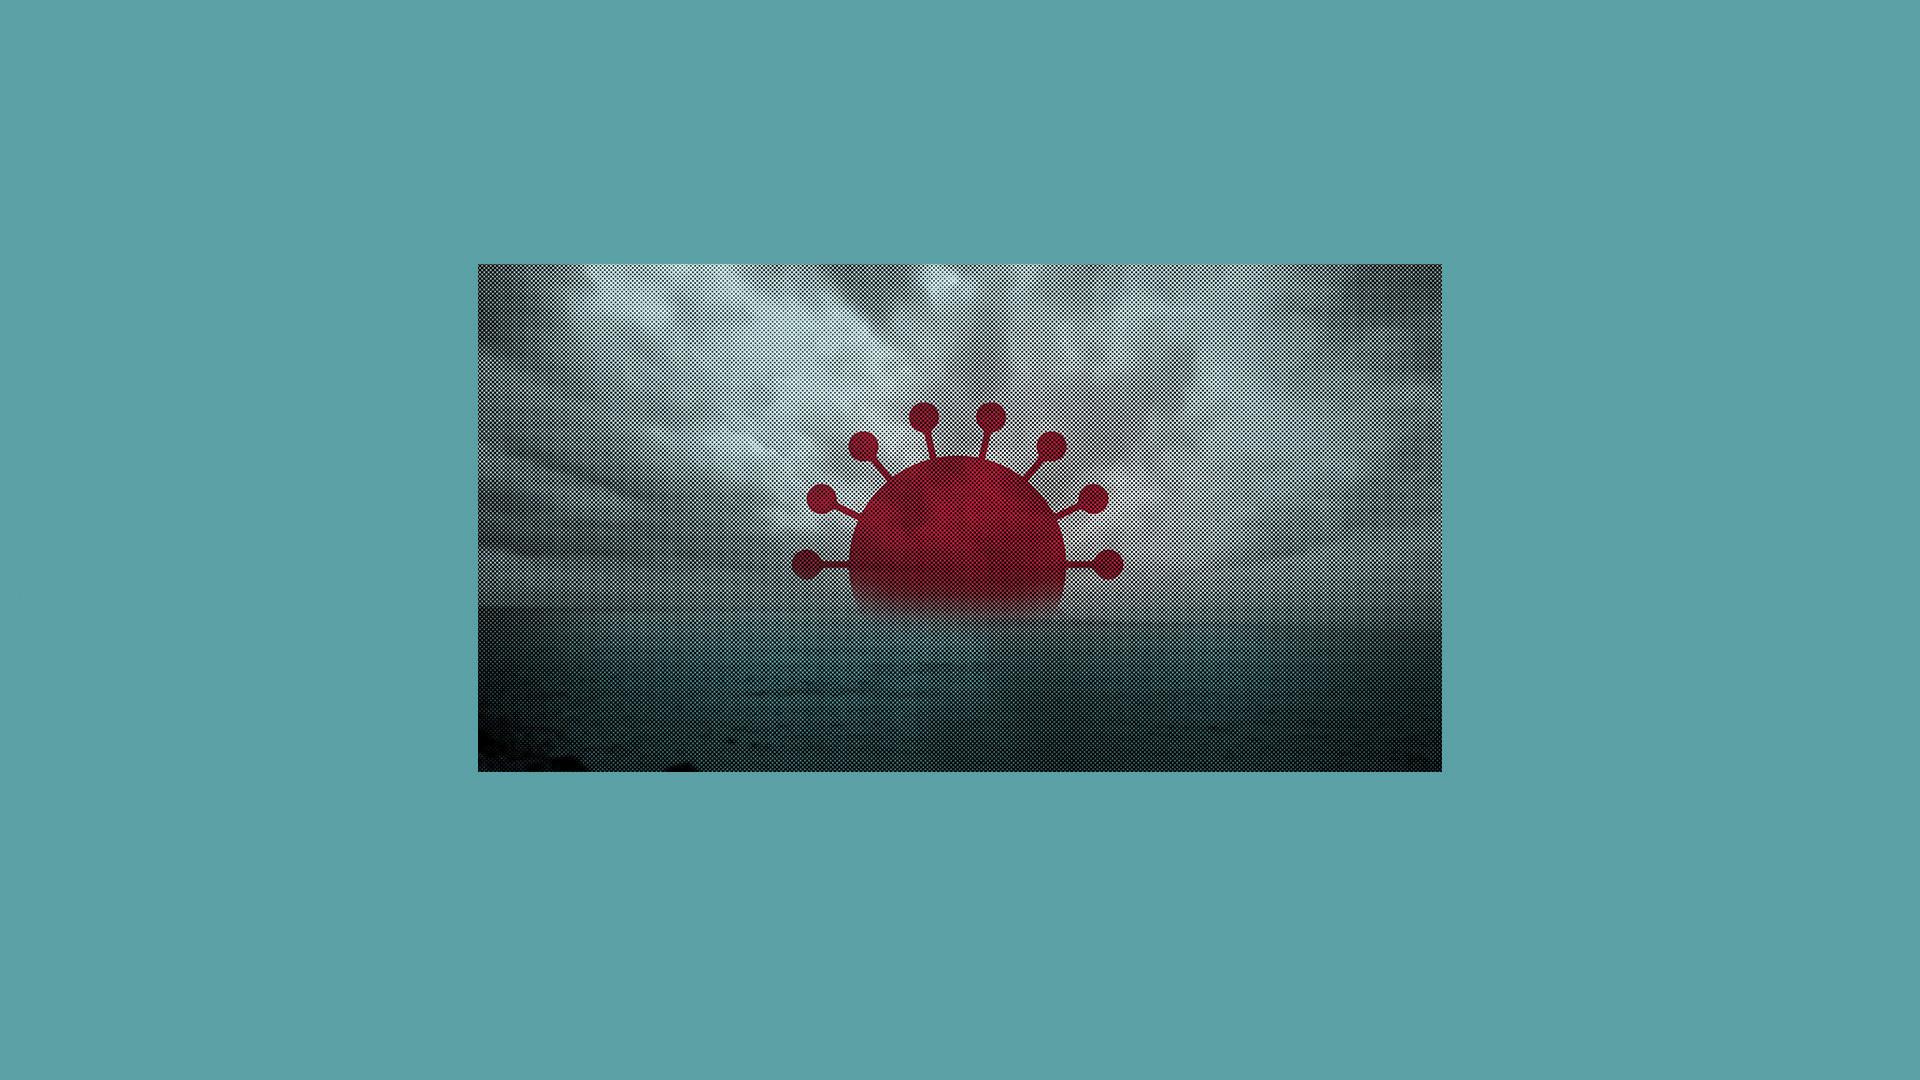 Virus Outbreak-Viral Questions-Virus Future